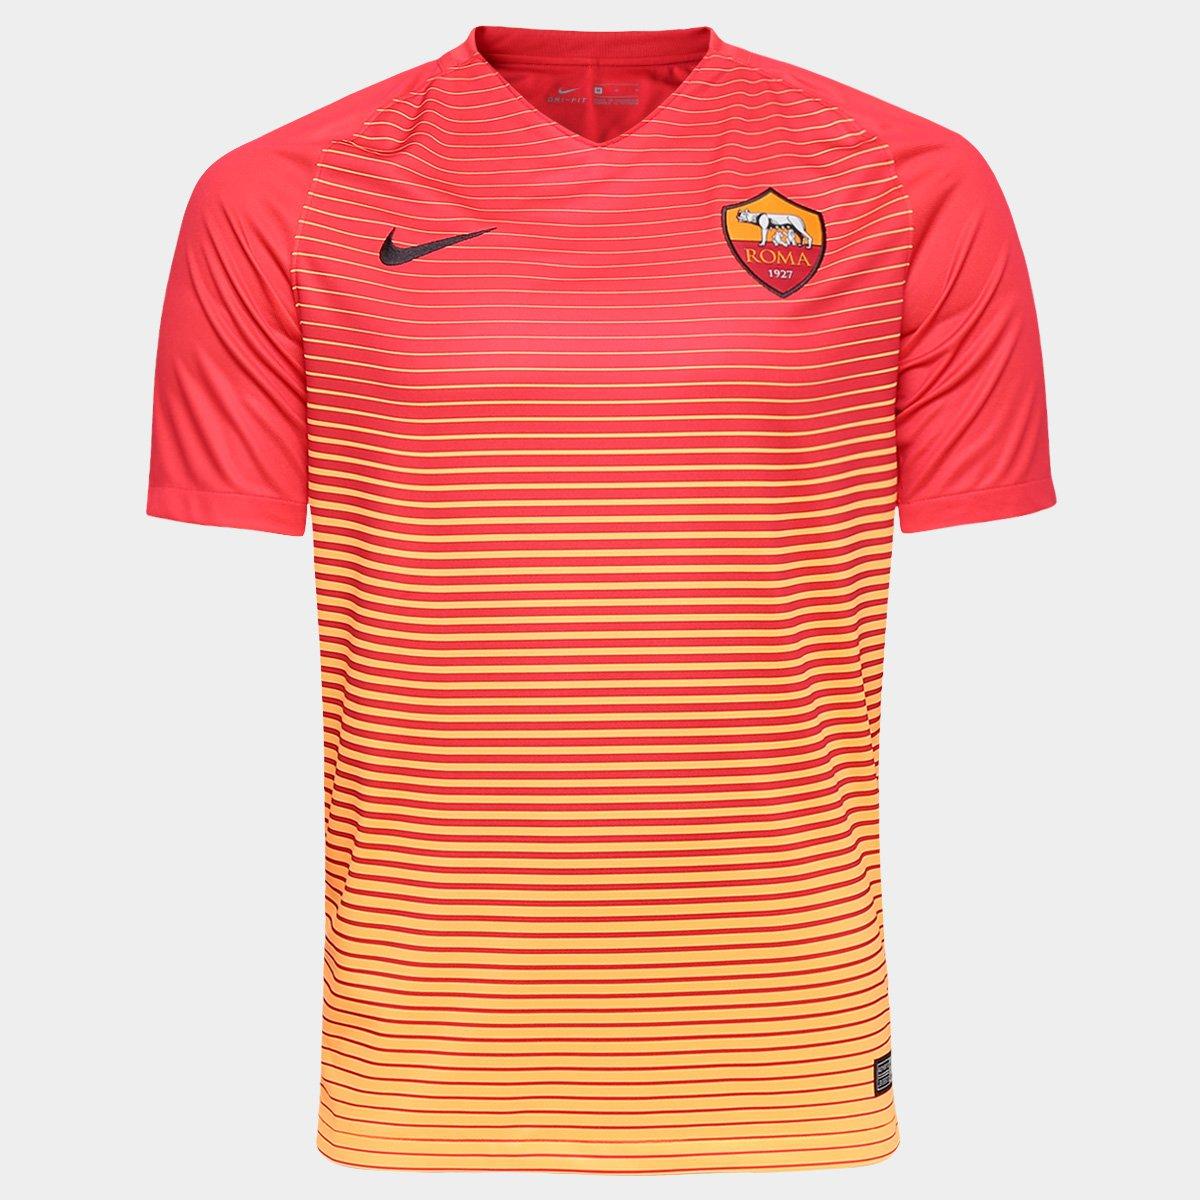 Camisa Roma Third 16 17 s nº - Torcedor Nike Masculina - Compre Agora  843fdf13bd69f